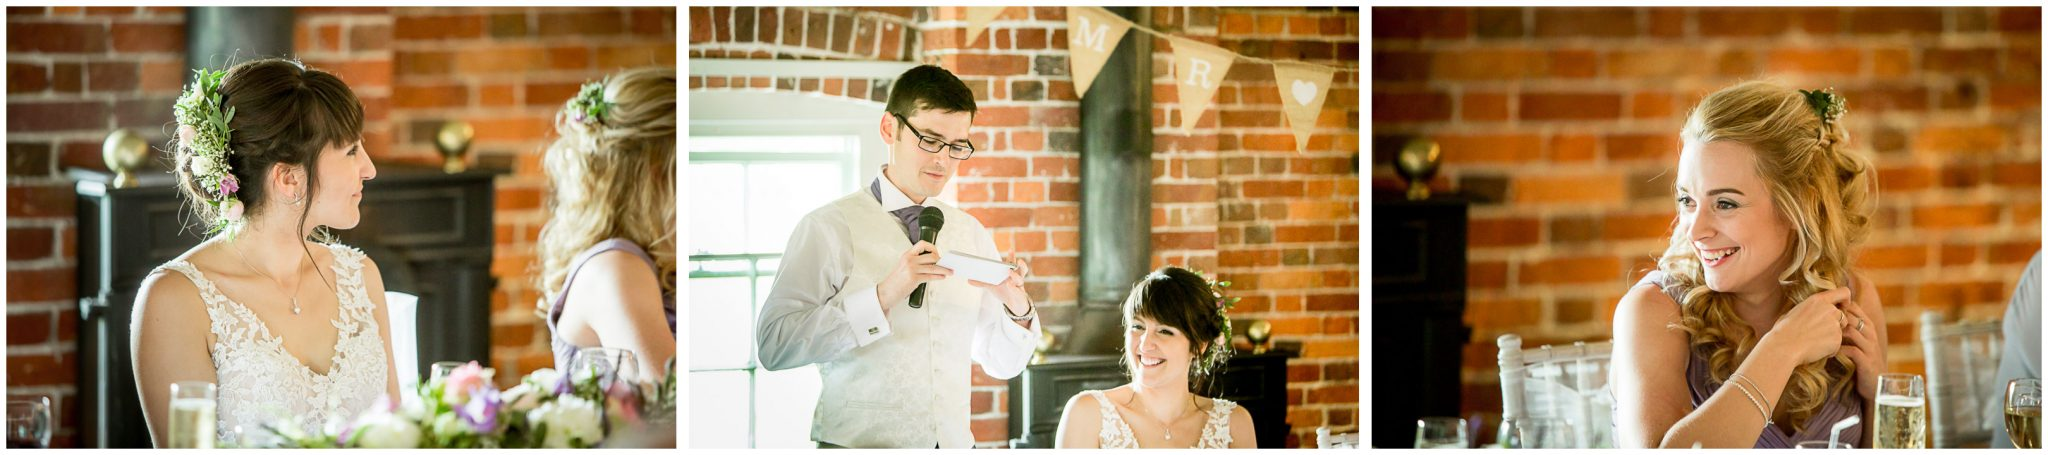 Sopley Mill wedding photography groom's speech